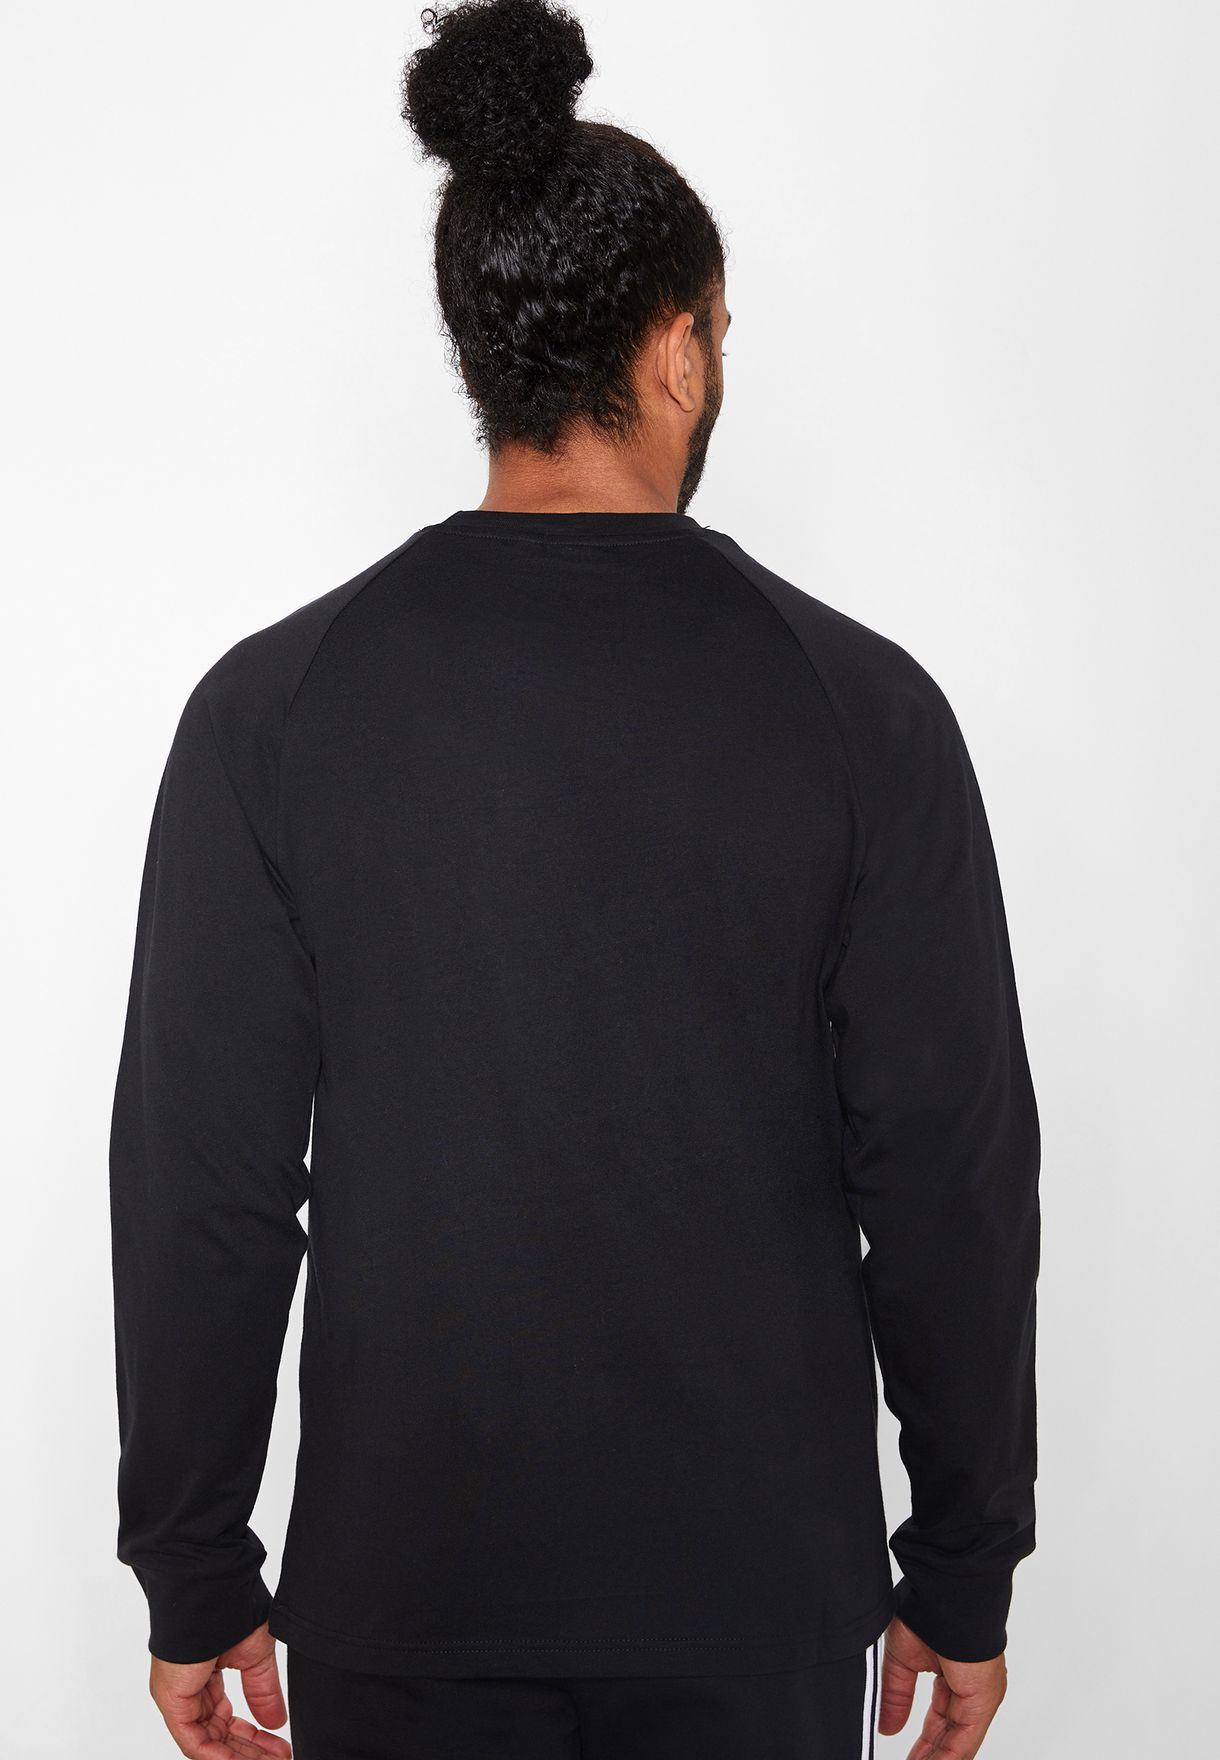 3 Stripes Casual Men's Long Sleeve T-Shirt